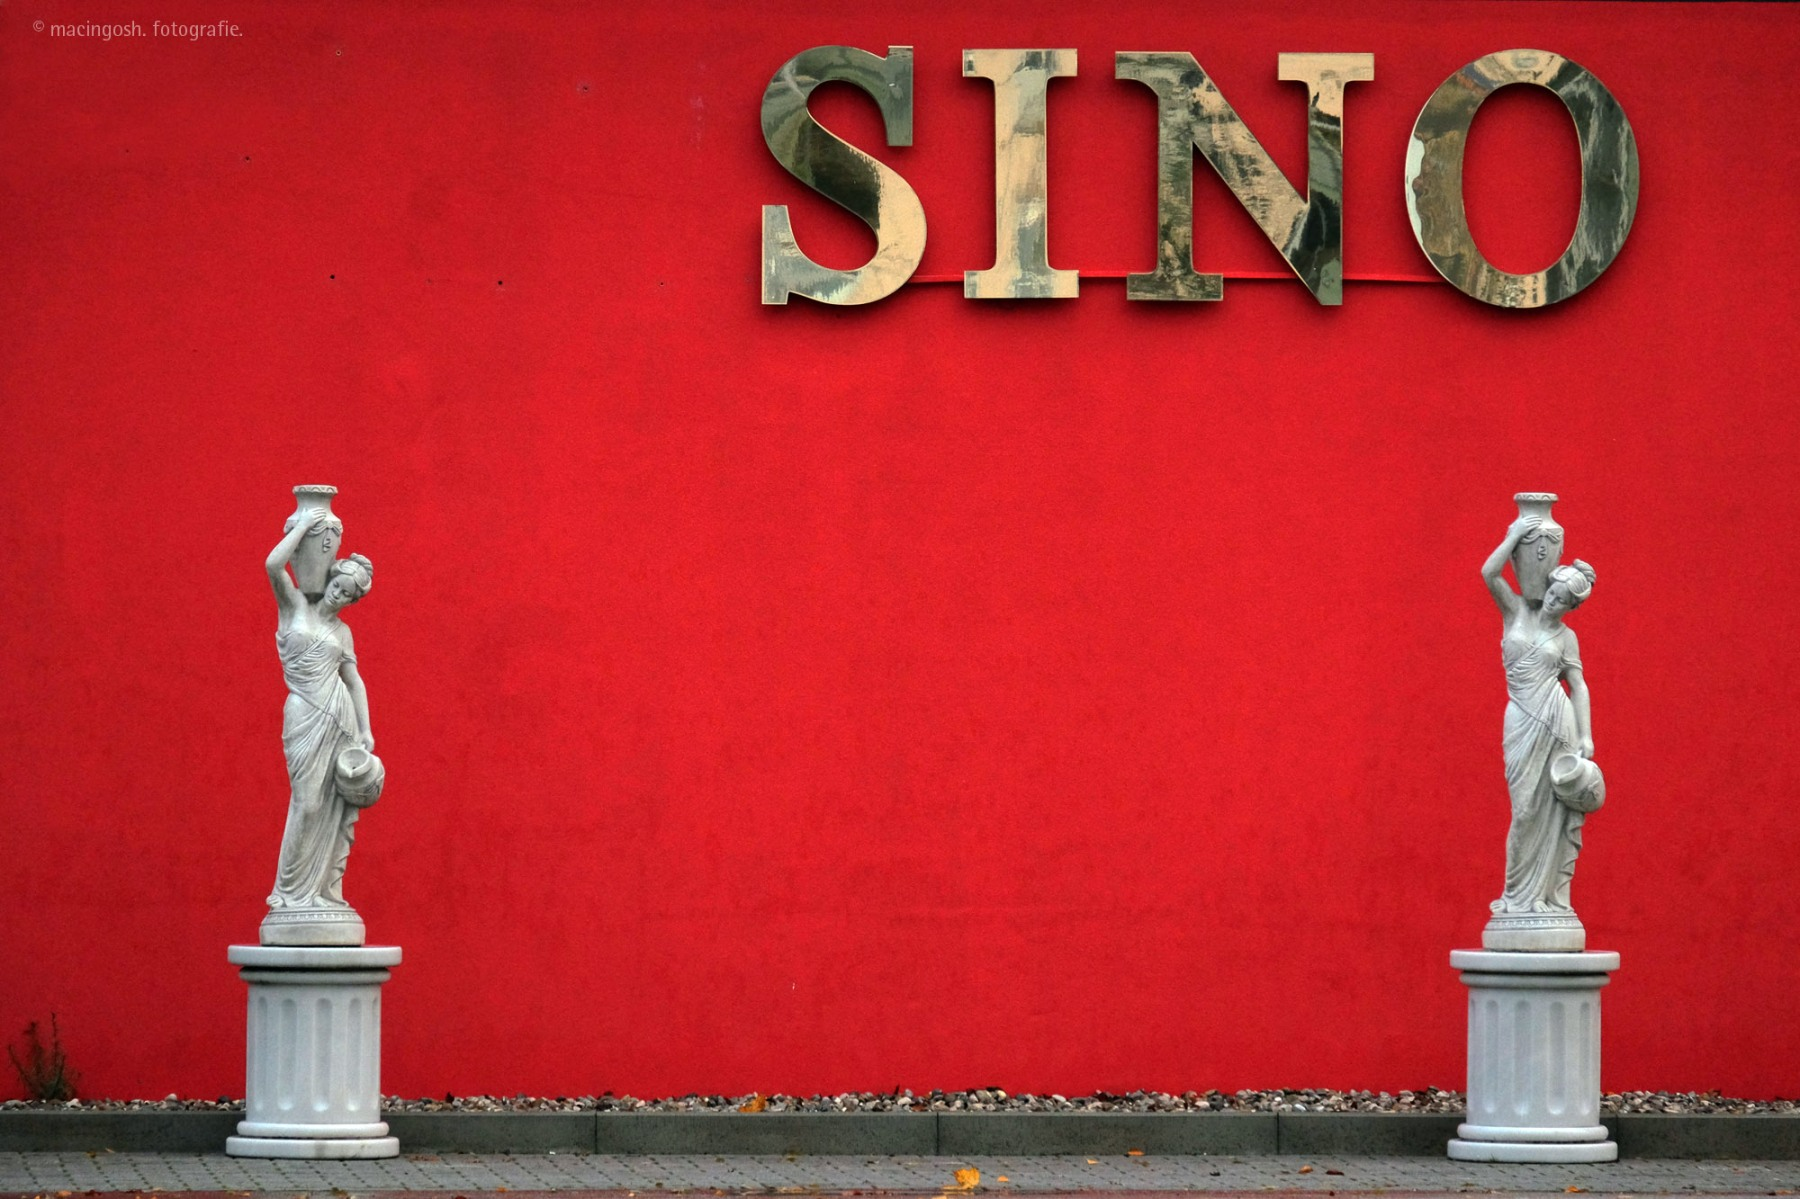 macingosh fotografie, munich, street photography